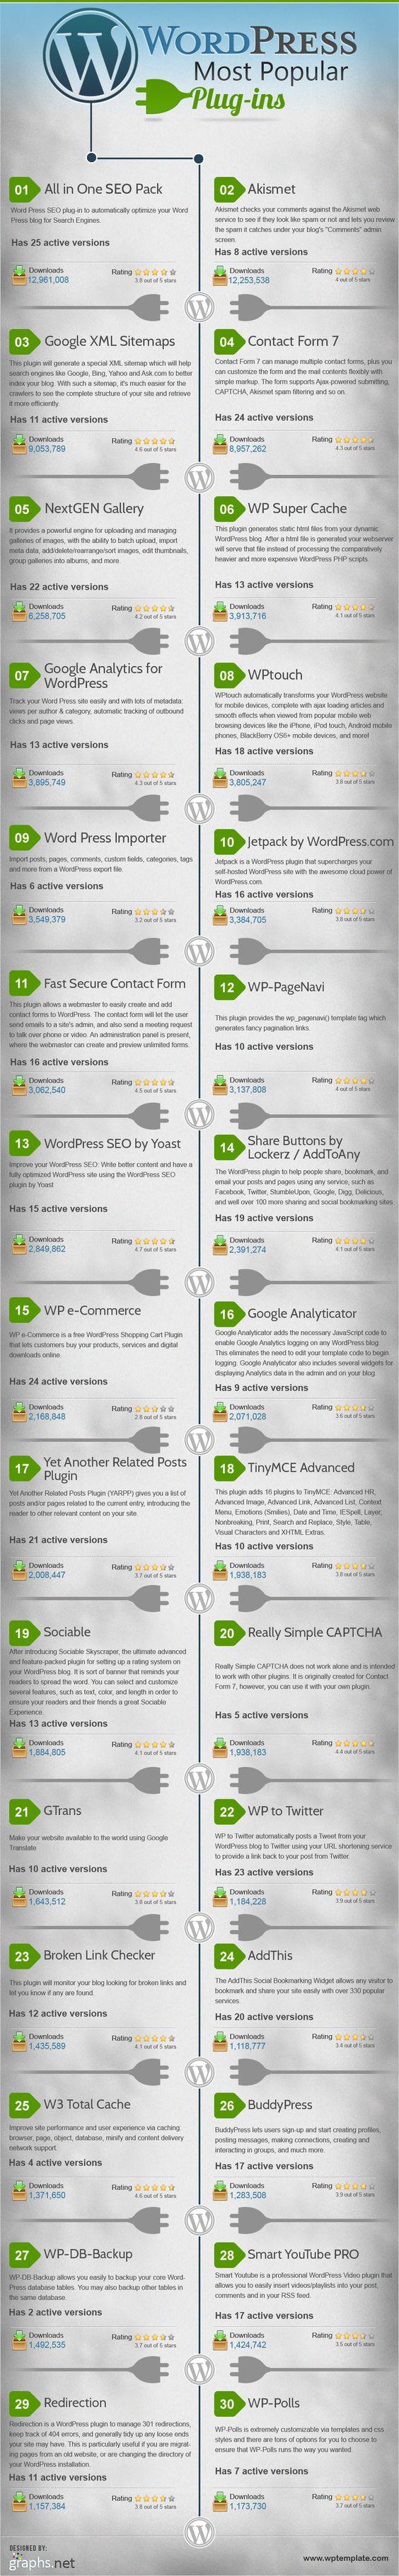 Die 30 beliebtesten Wordpress Plugins